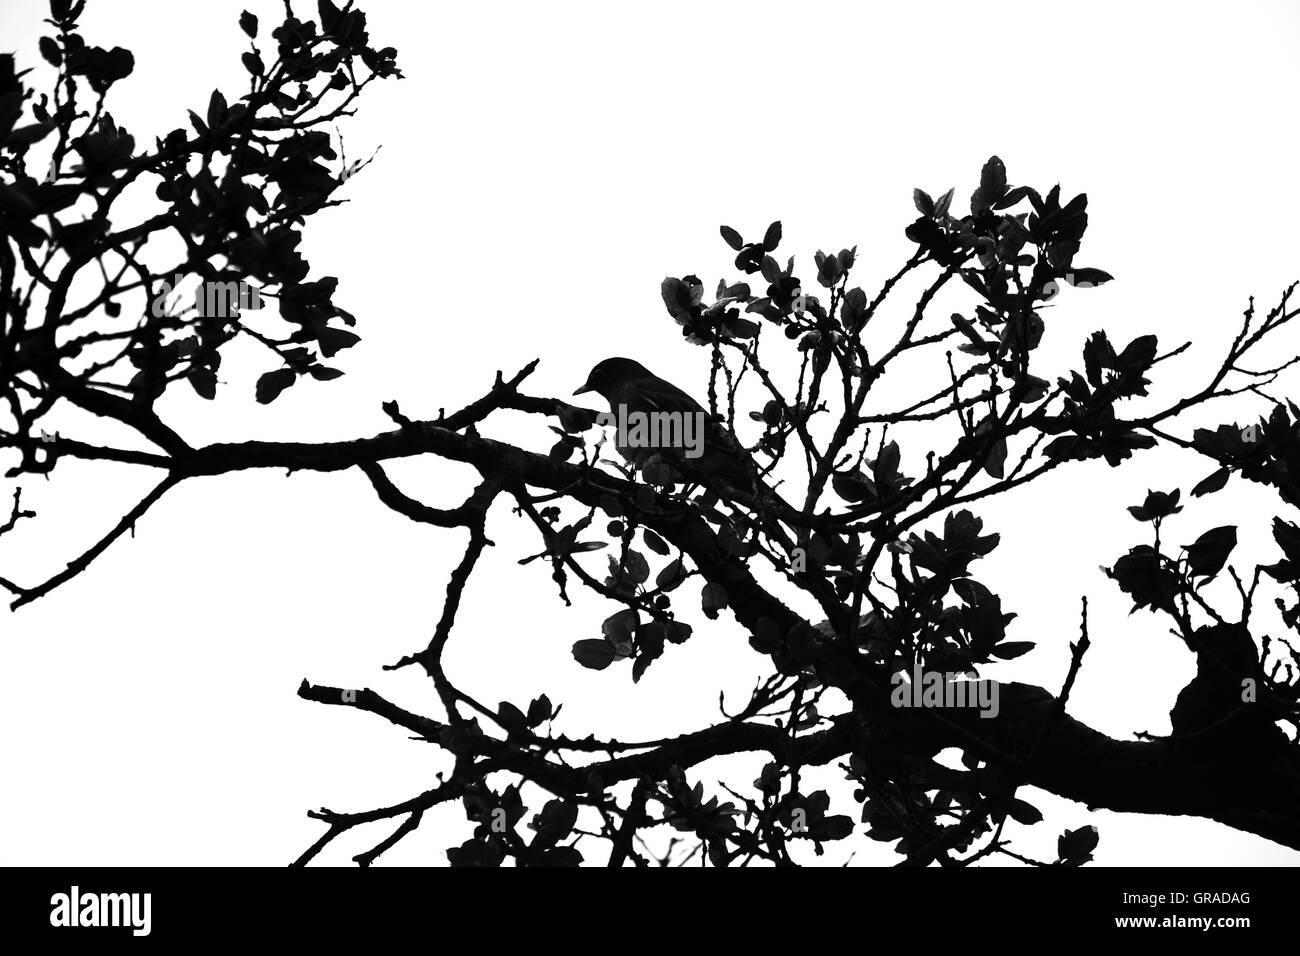 Bird Sitting In Tree Silhouette - Stock Image